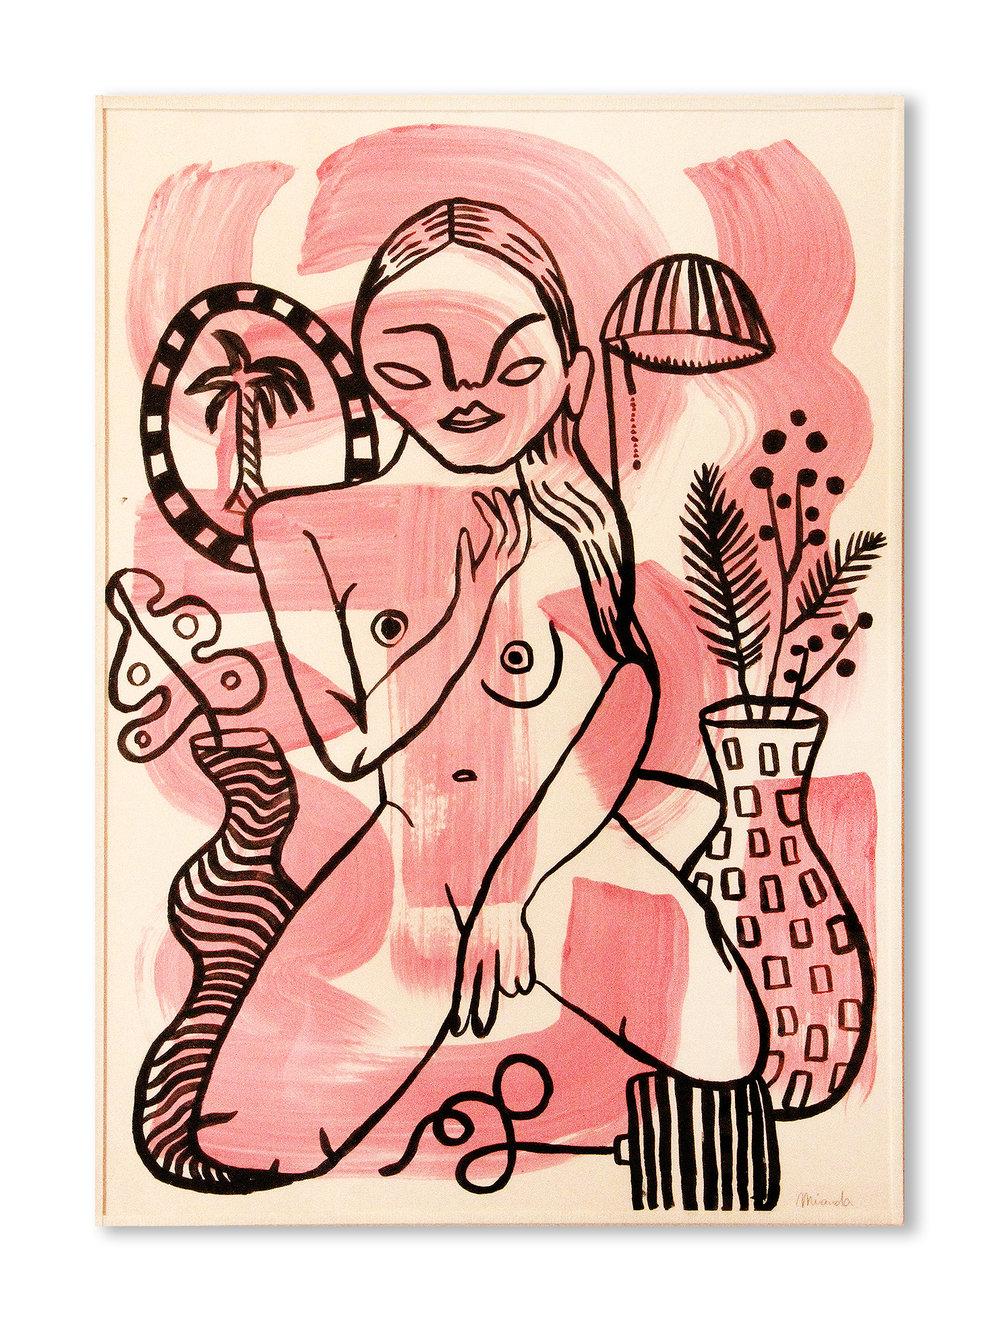 Chica home alone   Acrilico sobre papel 45,4 x 32,8 cm